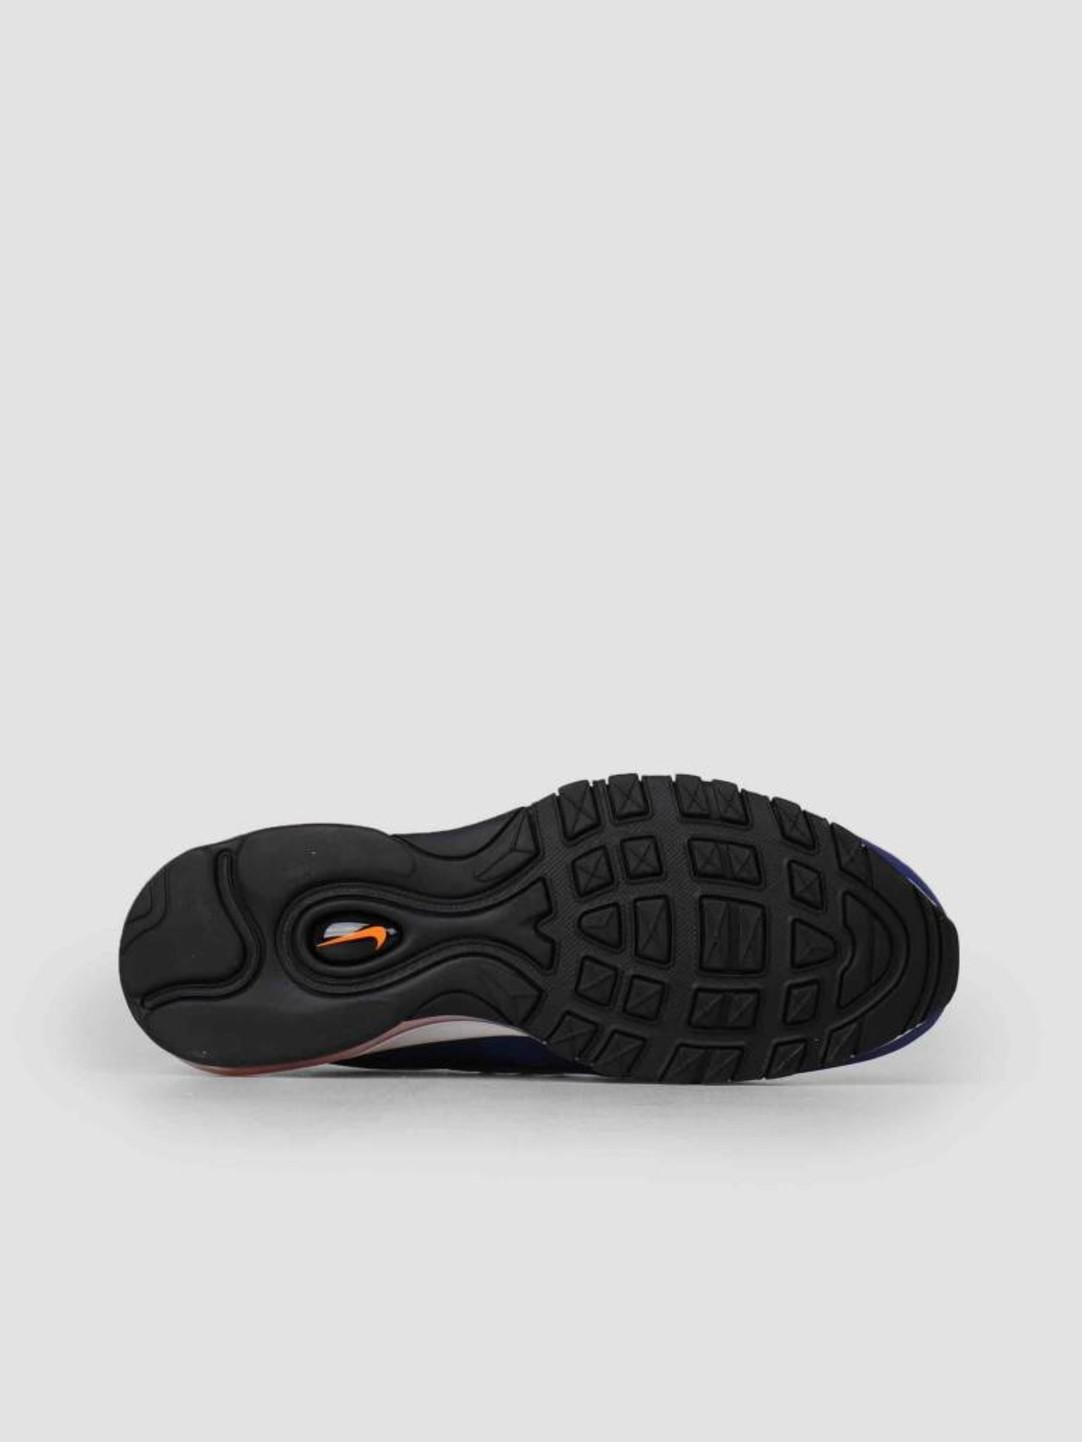 Nike Nike Air Max 98 White Deep Royal Blue-Total Orange-Black Cd1536-100